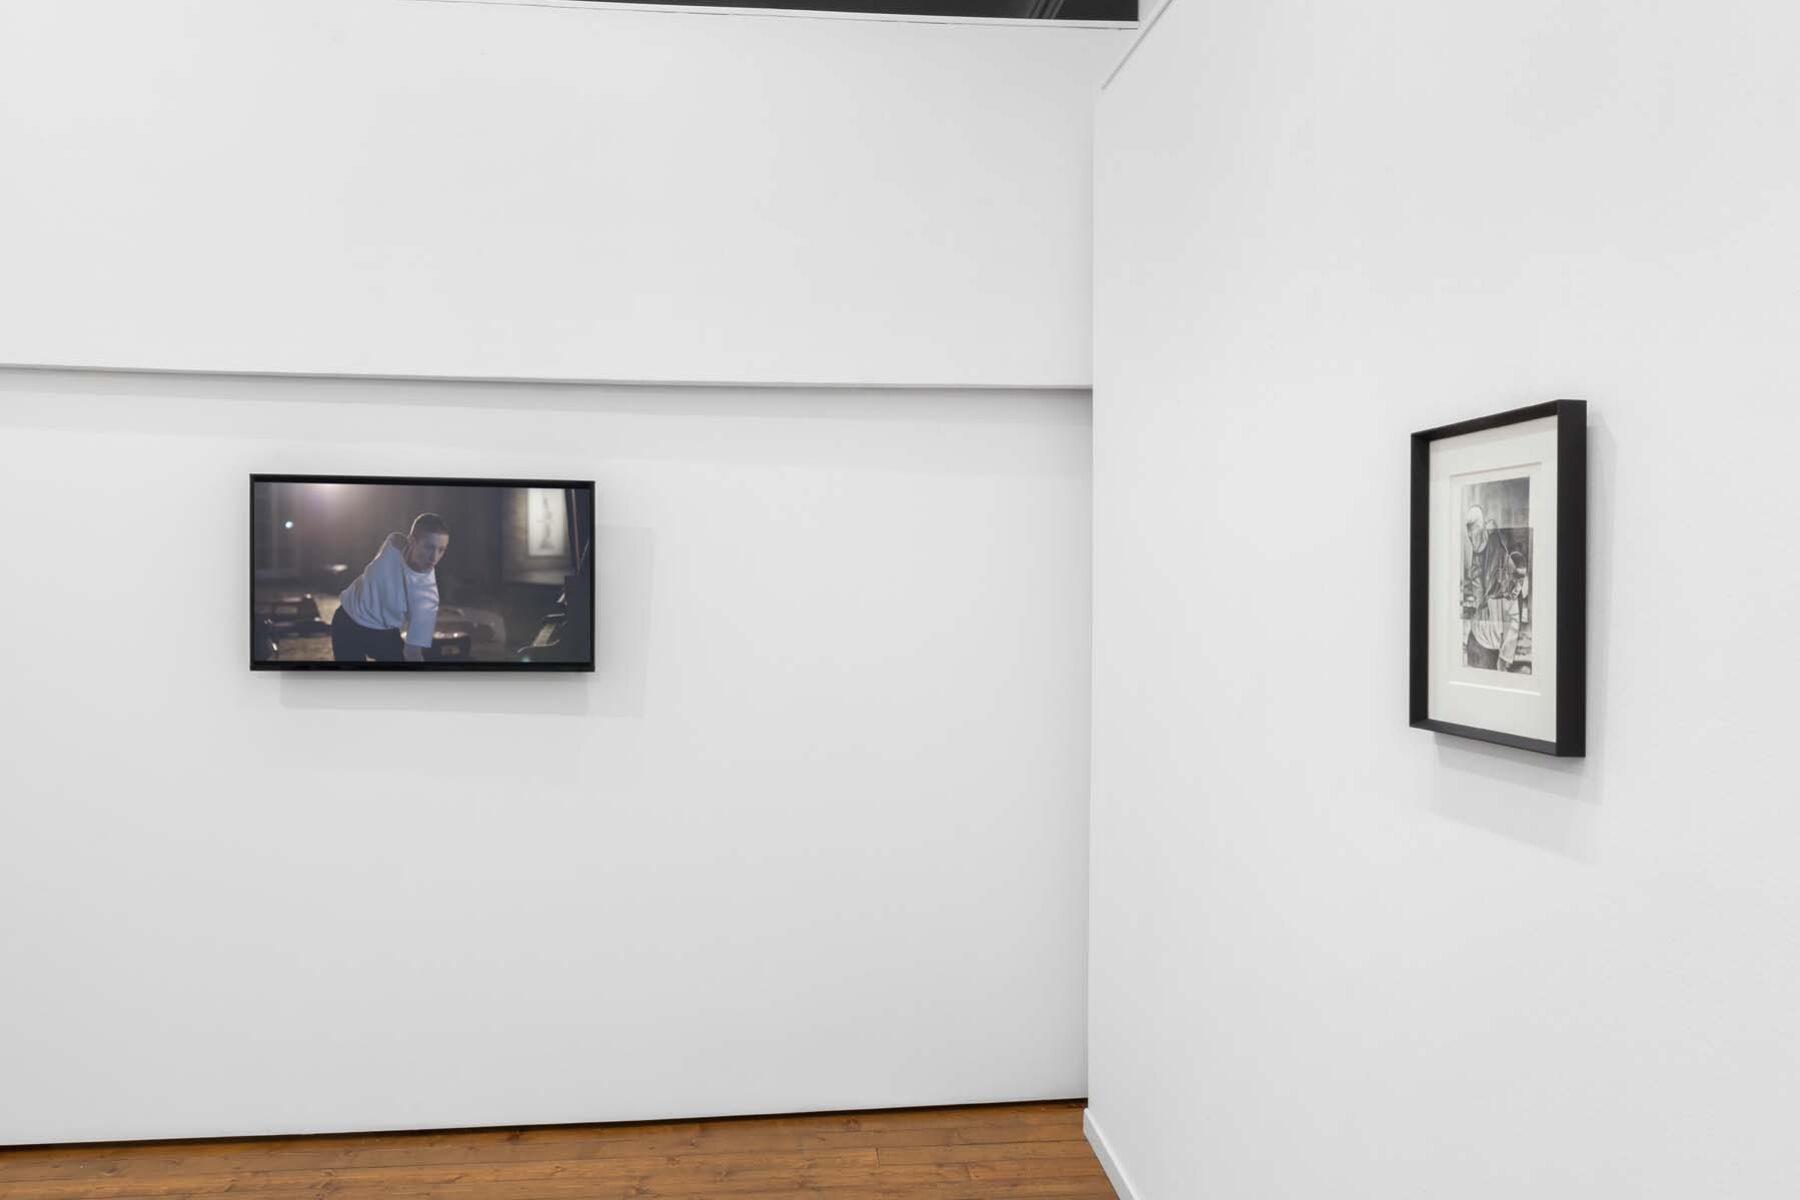 Filip Markiewicz, Road to Nowhere, installation view, C+N Canepaneri, Milano, ph. Mattia Mognetti